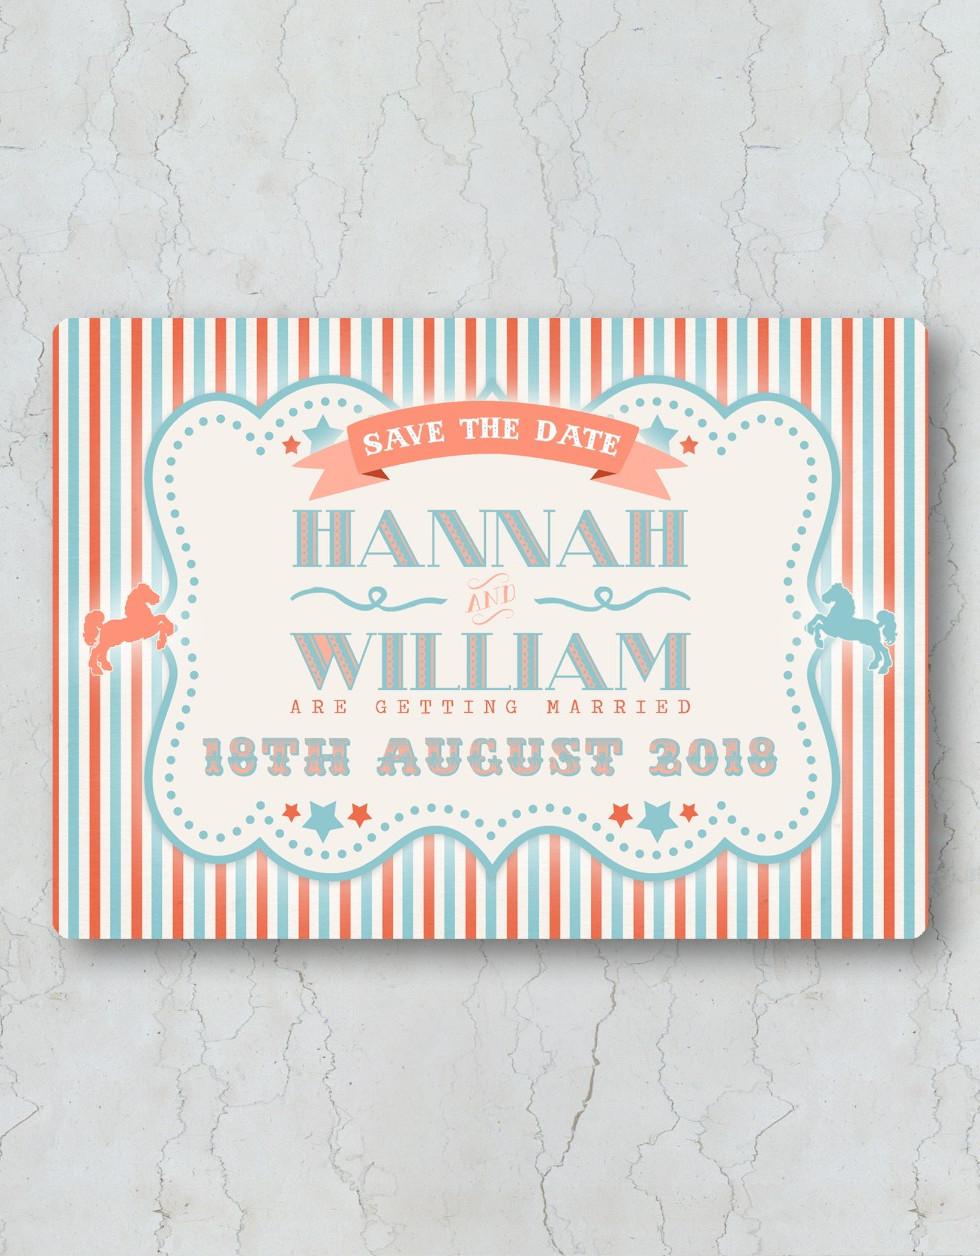 Funfair Save the Date Wedding Invitation